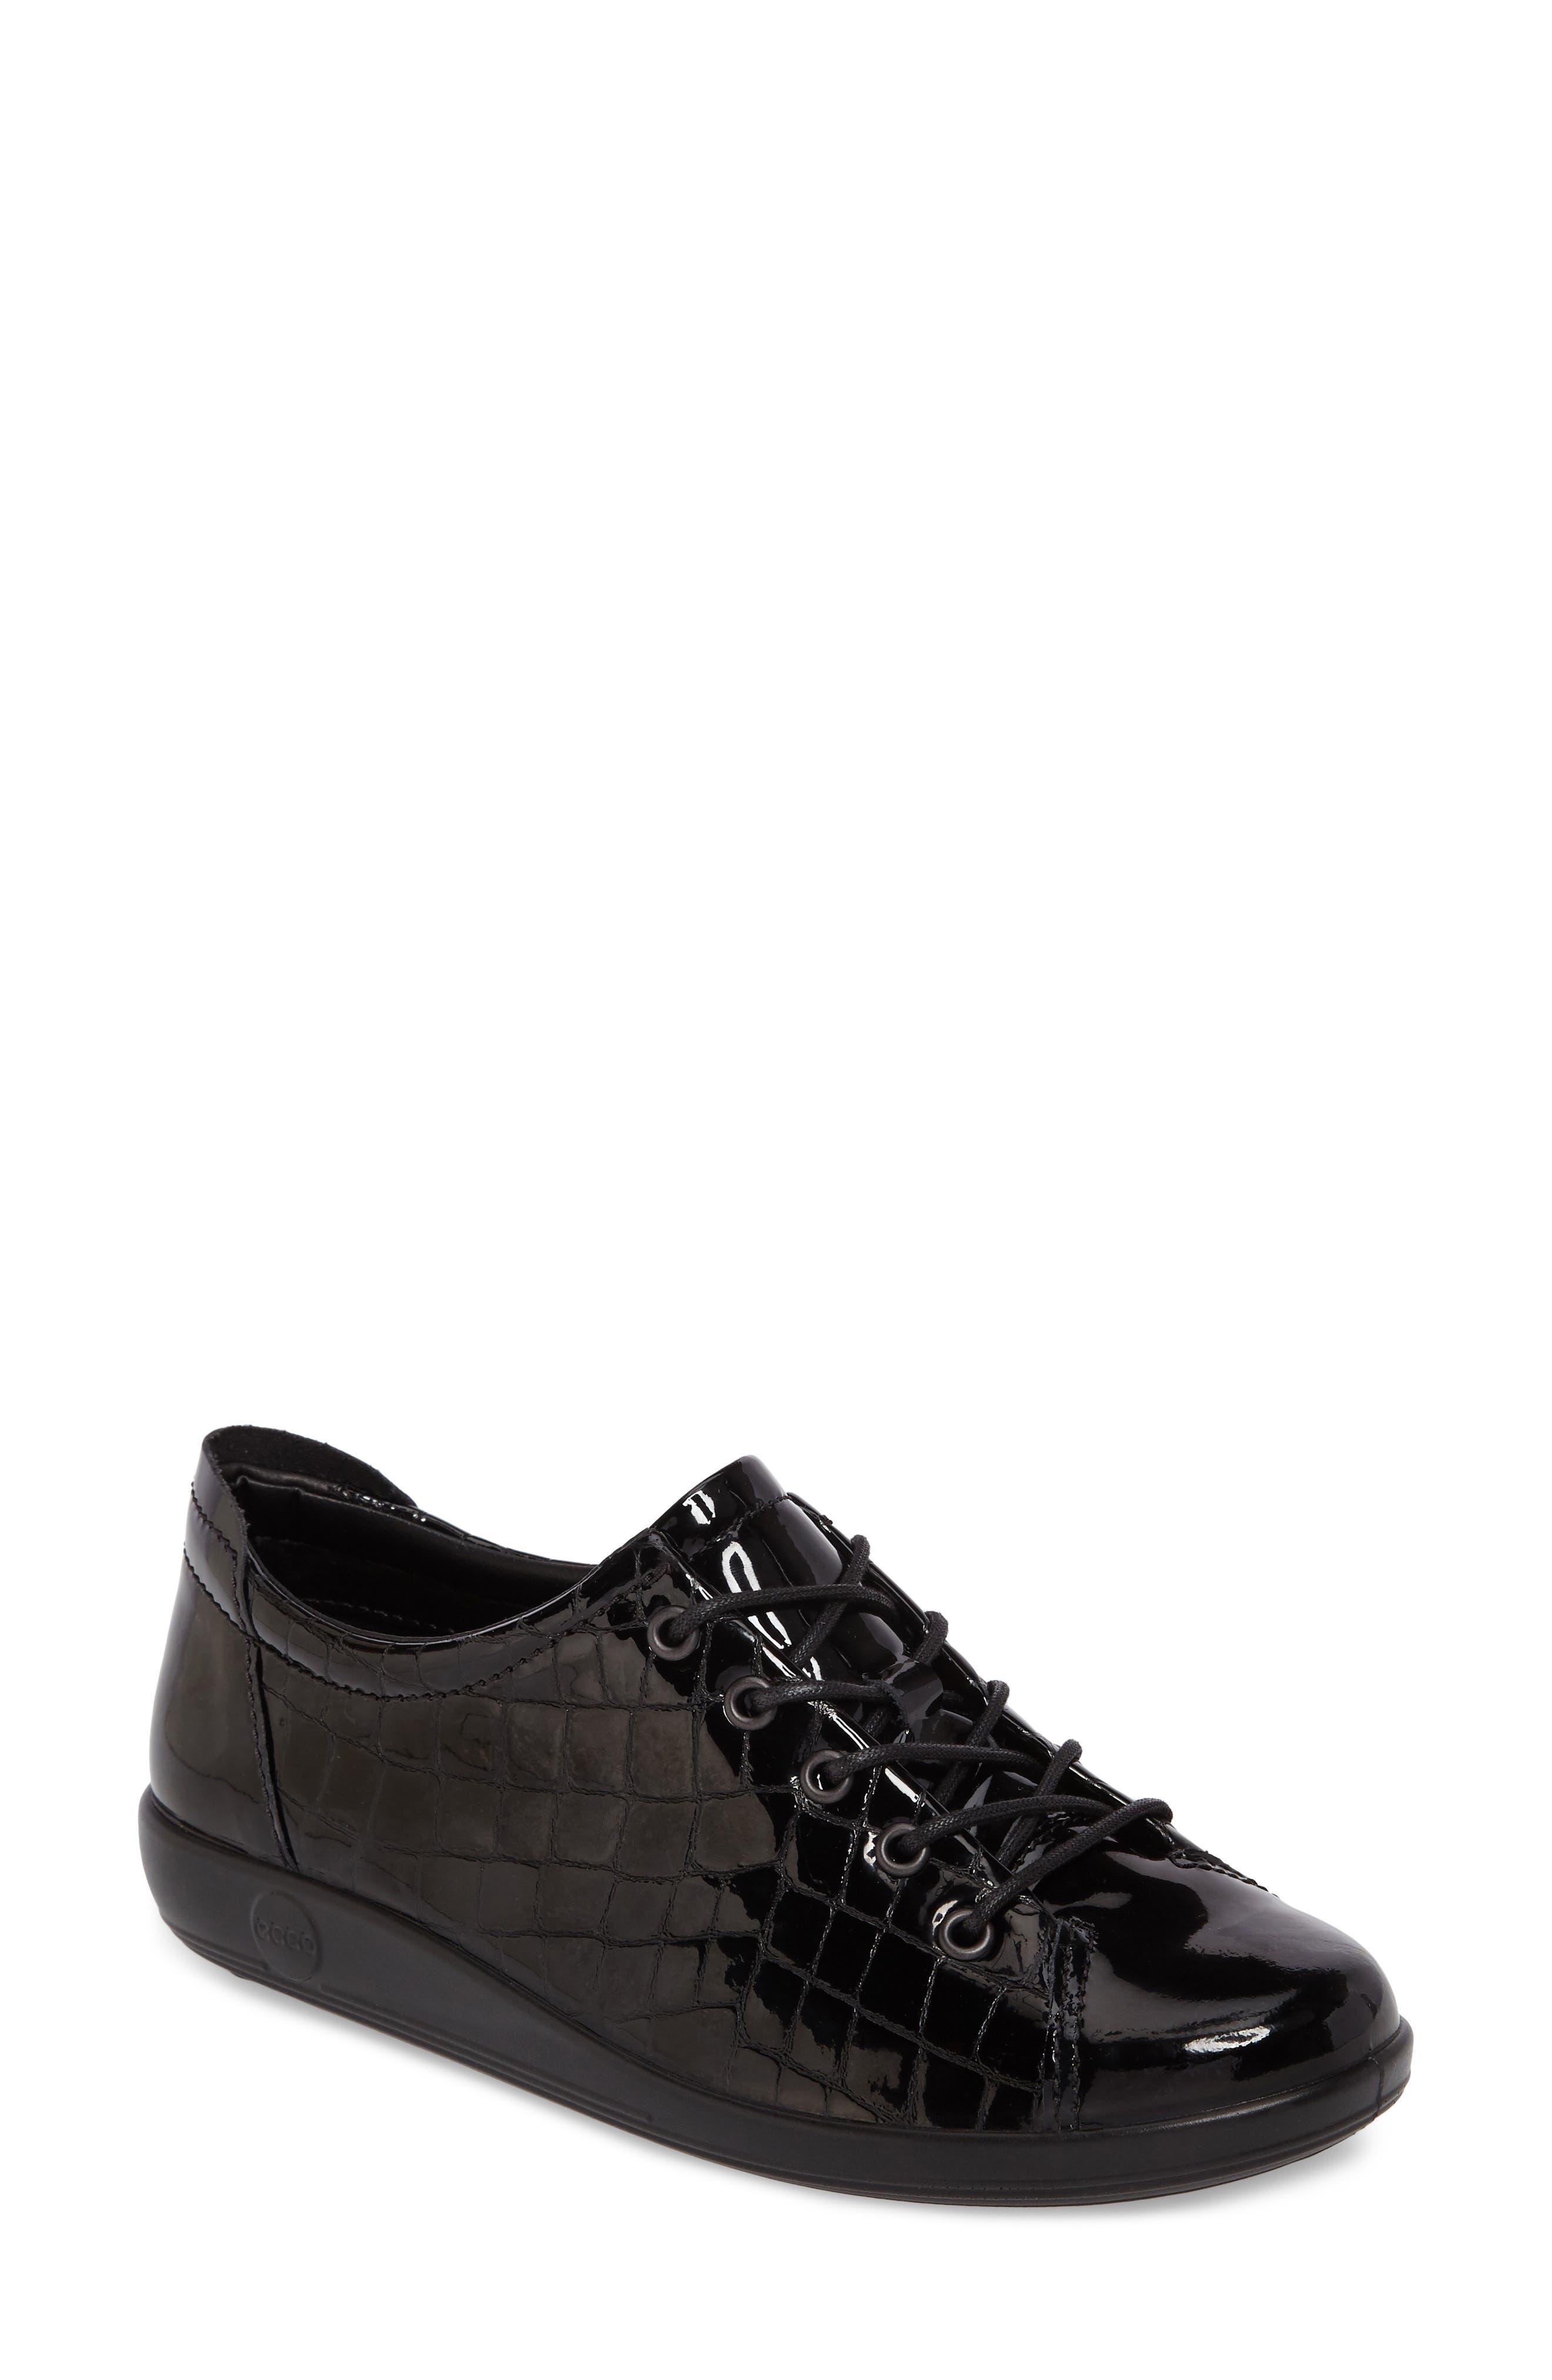 'Soft 2.0' Sneaker,                             Main thumbnail 1, color,                             019